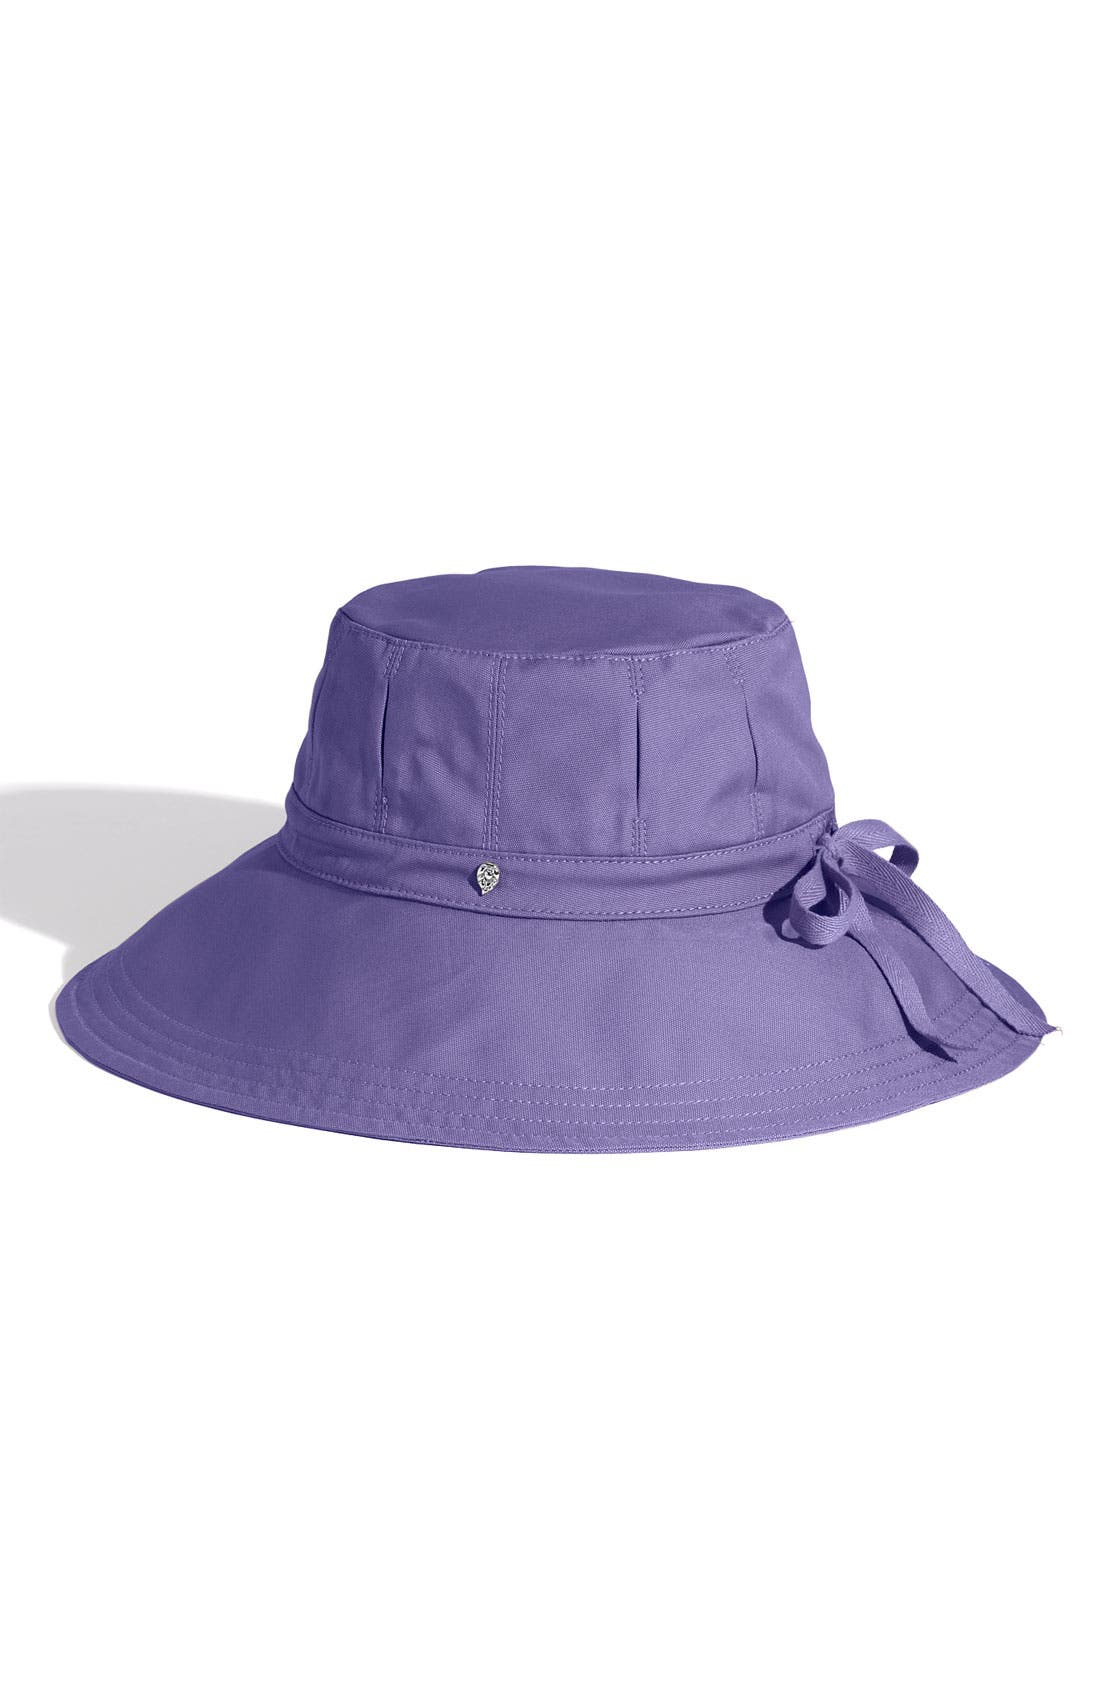 Alternate Image 1 Selected - Helen Kaminski 'Zindira' Hat